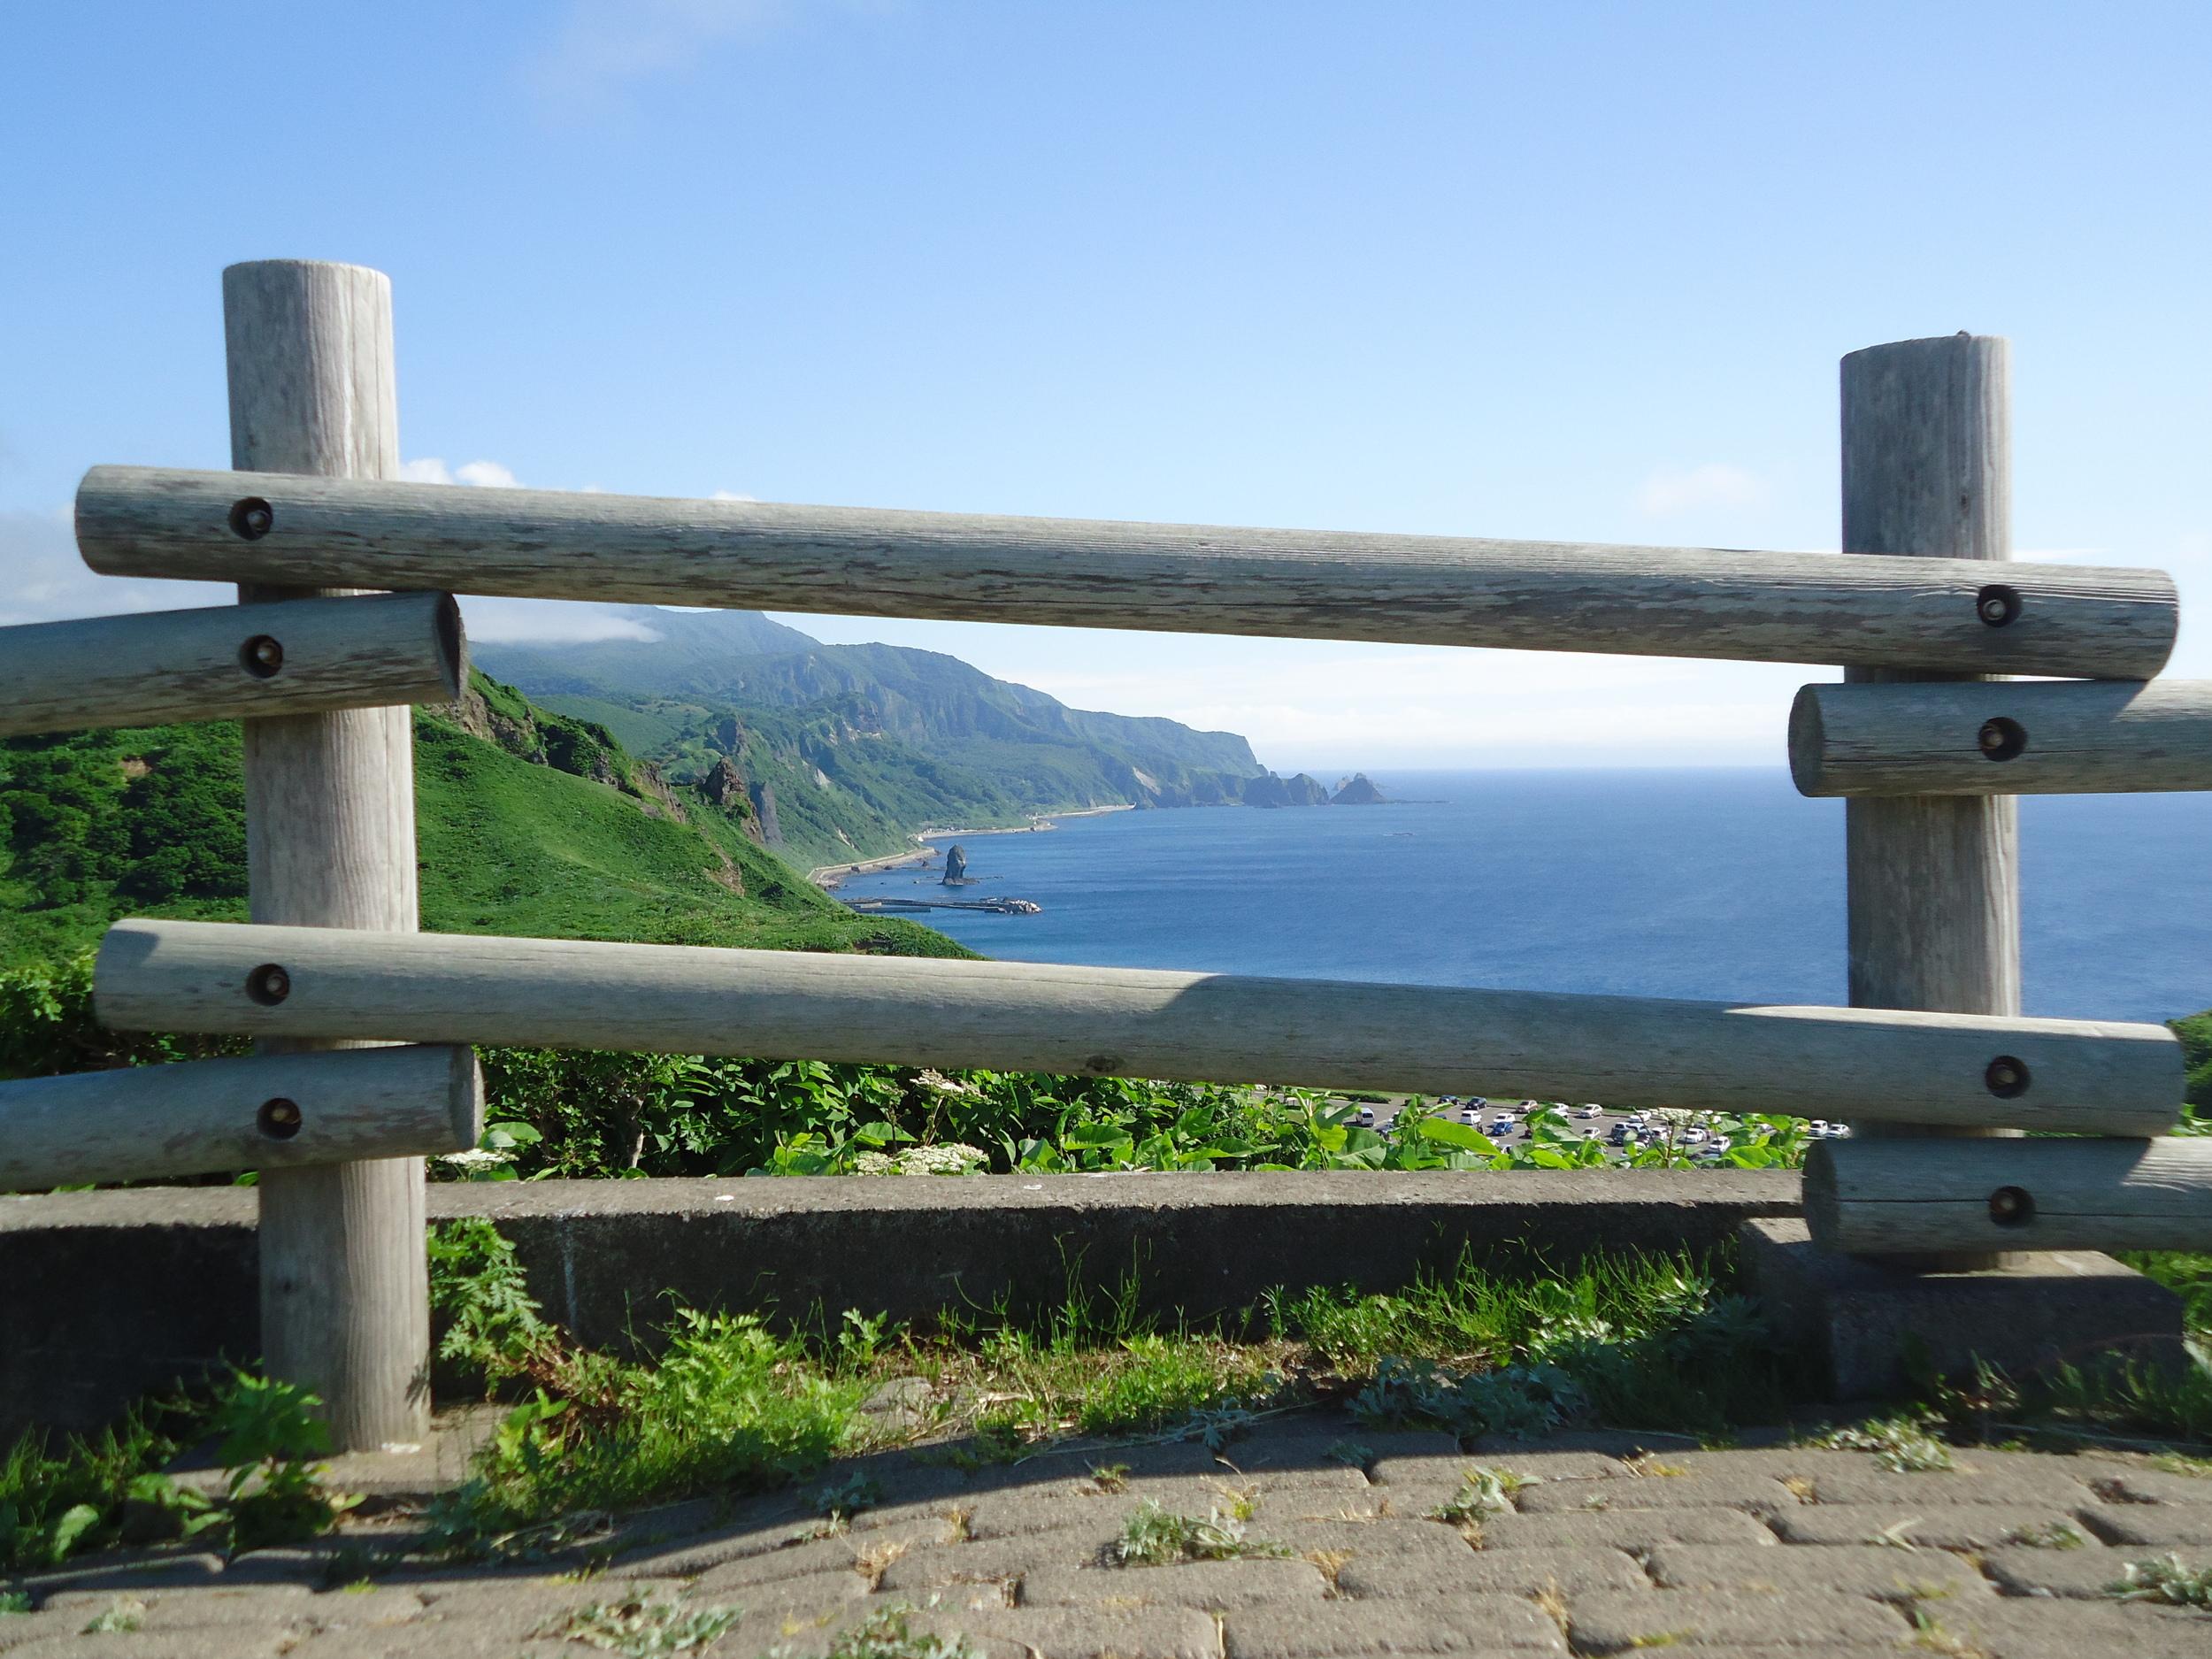 Railing View